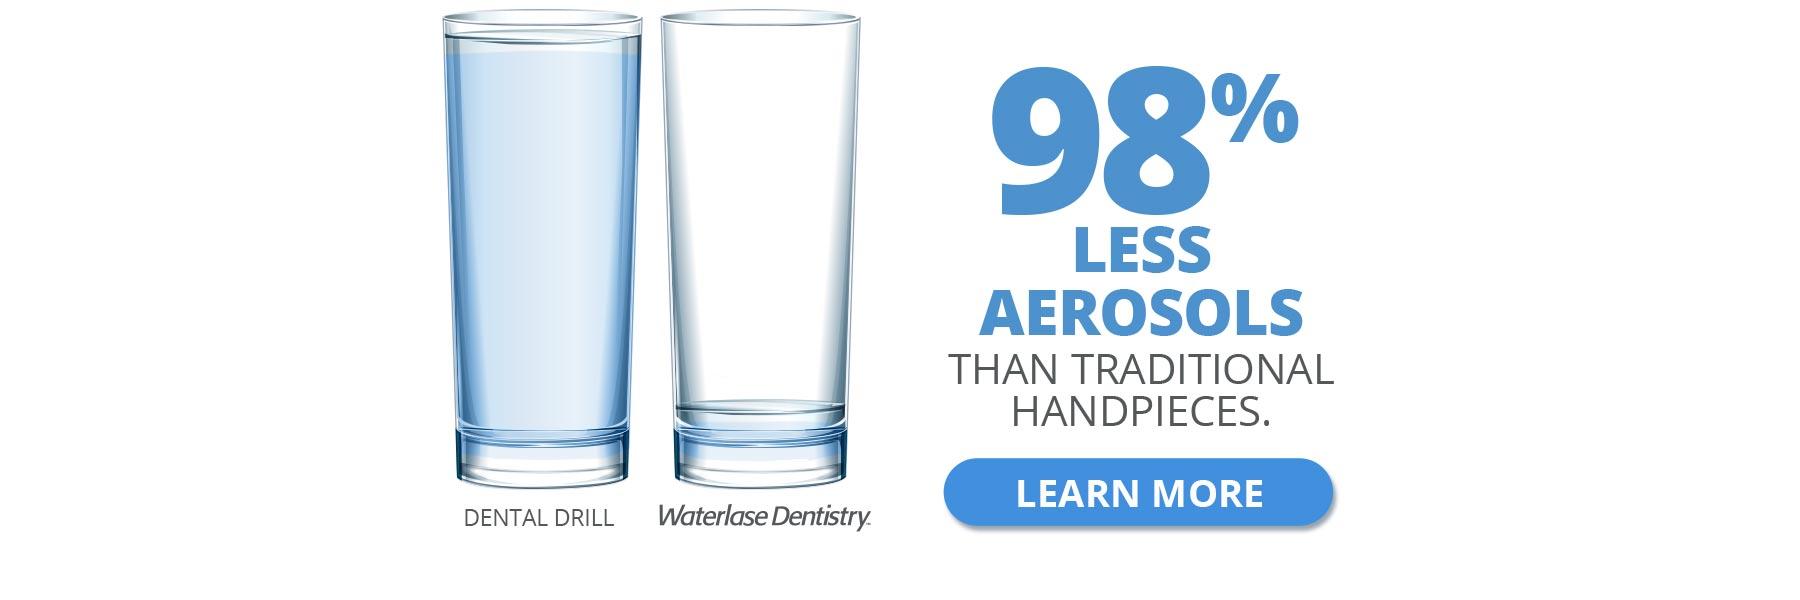 98% Less Aerosols